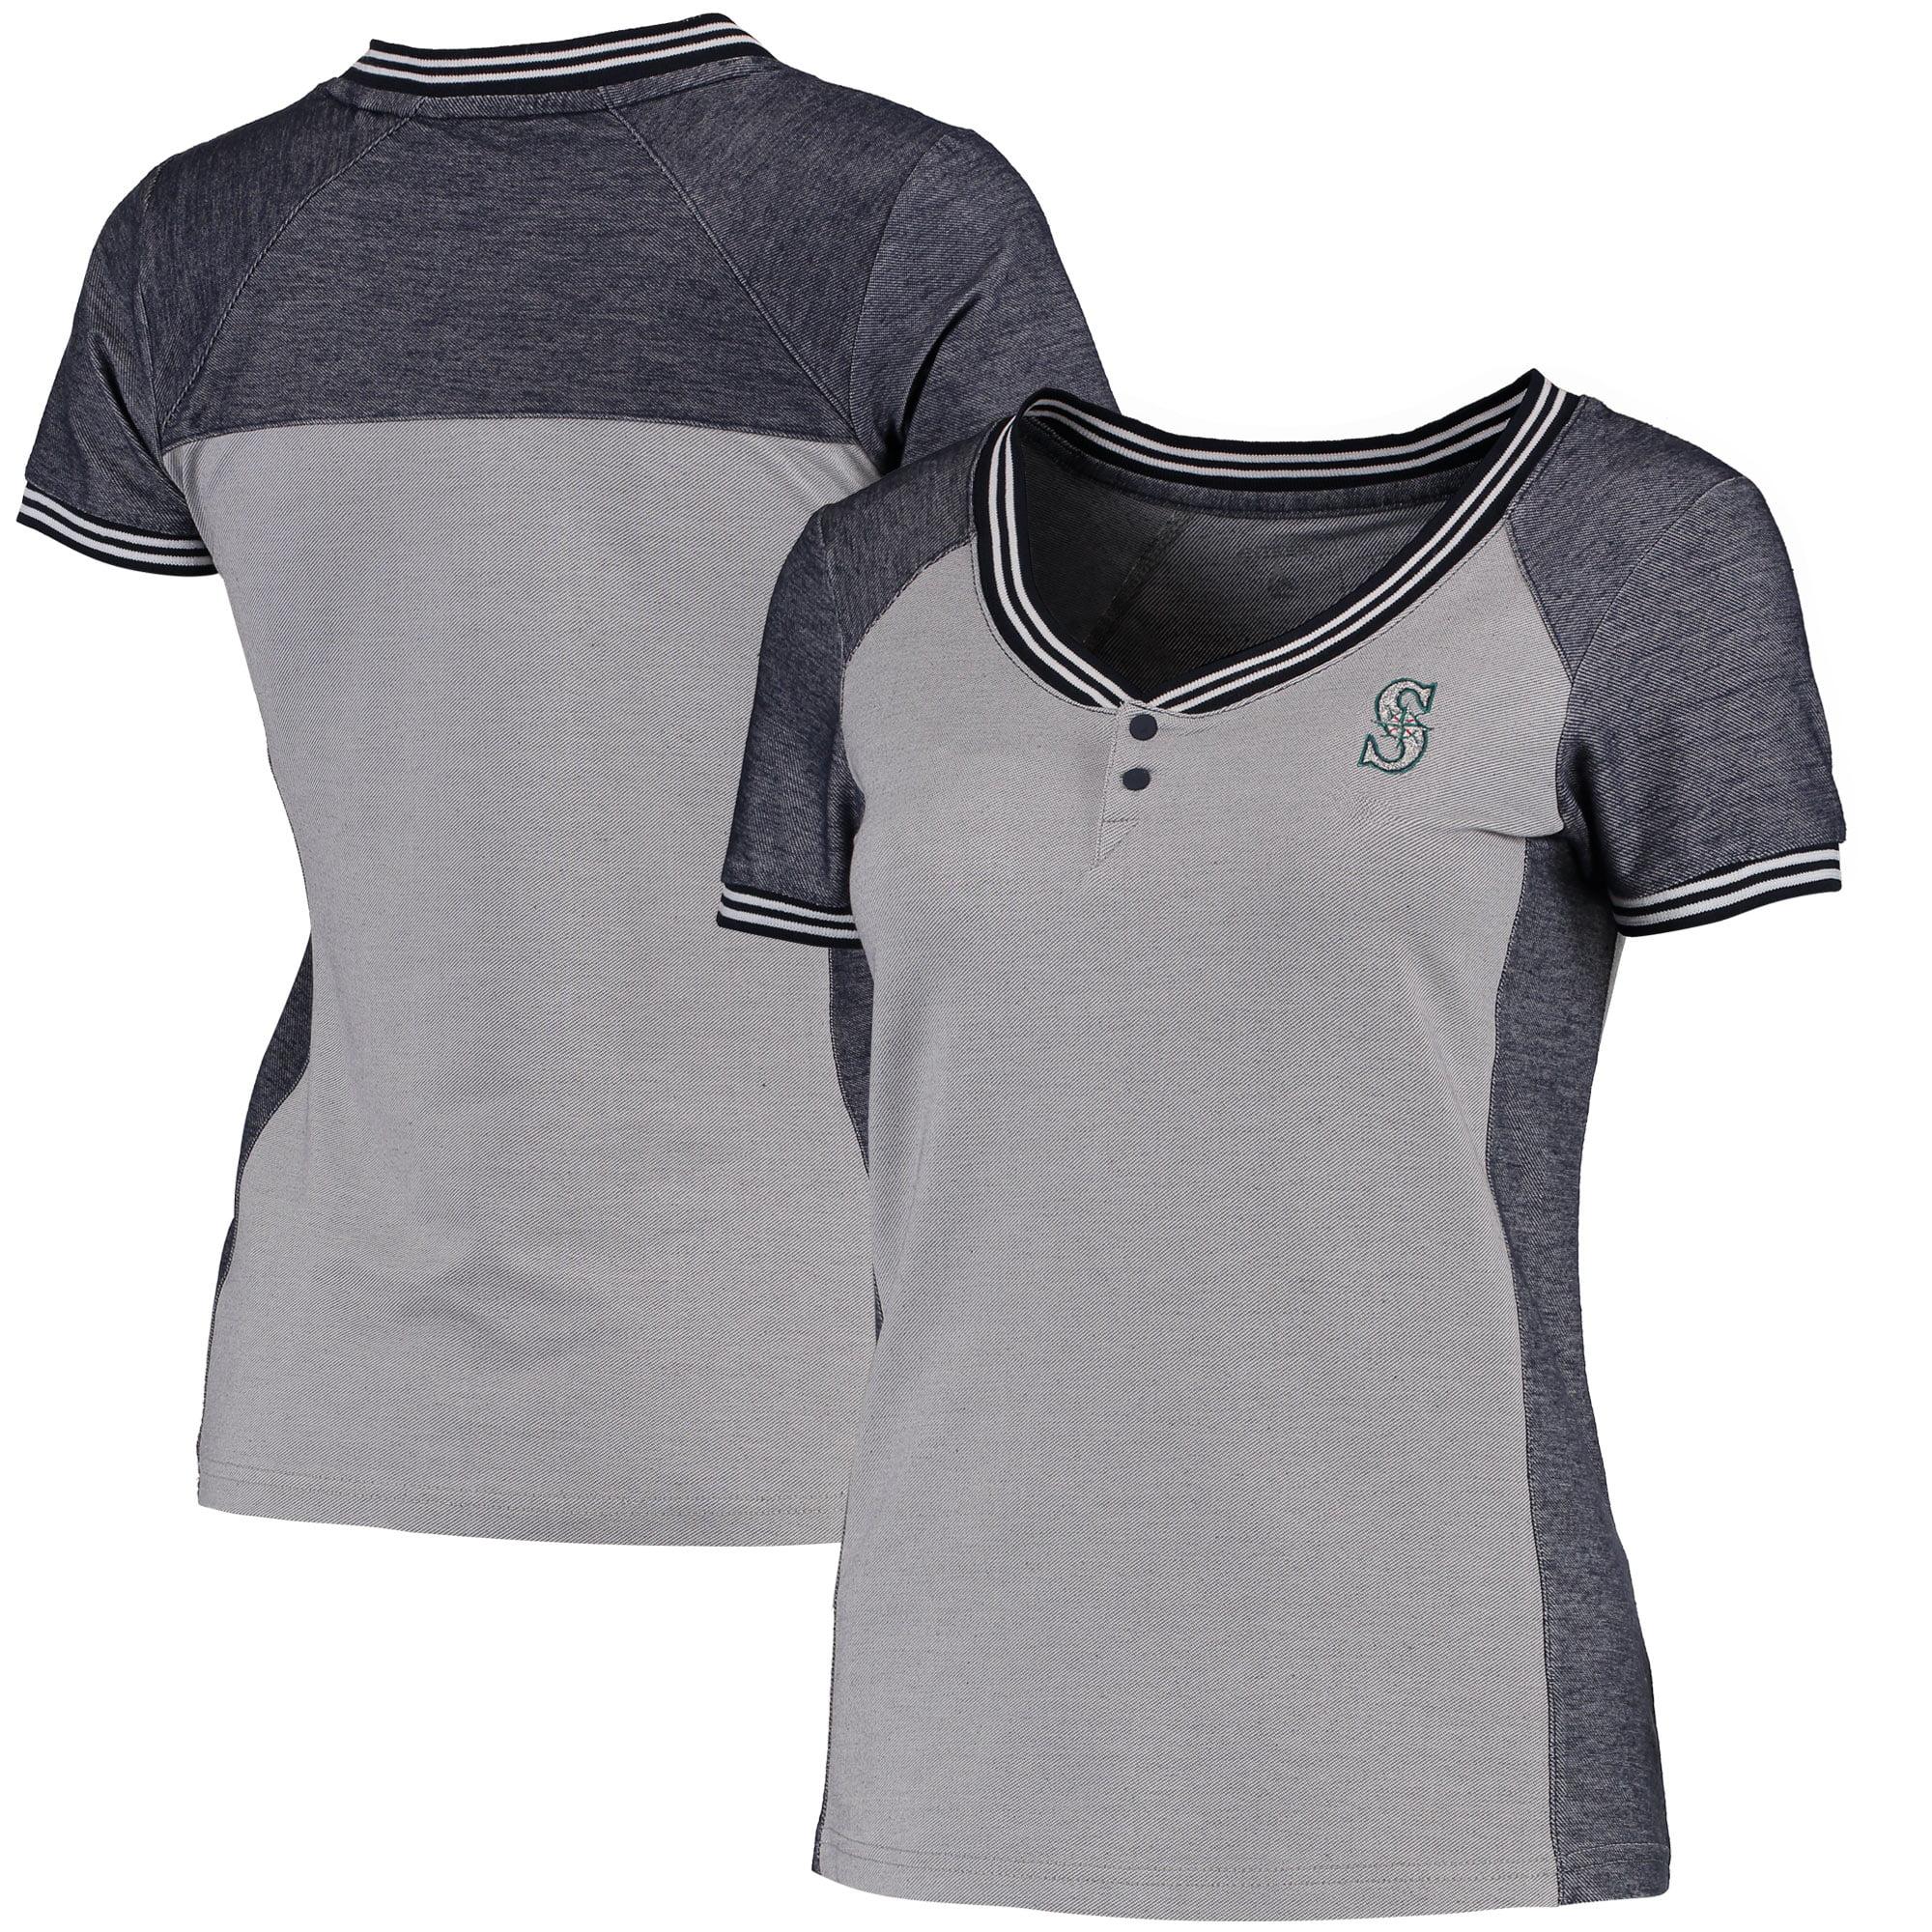 Seattle Mariners Antigua Women's Quick Henley T-Shirt - Gray/Navy